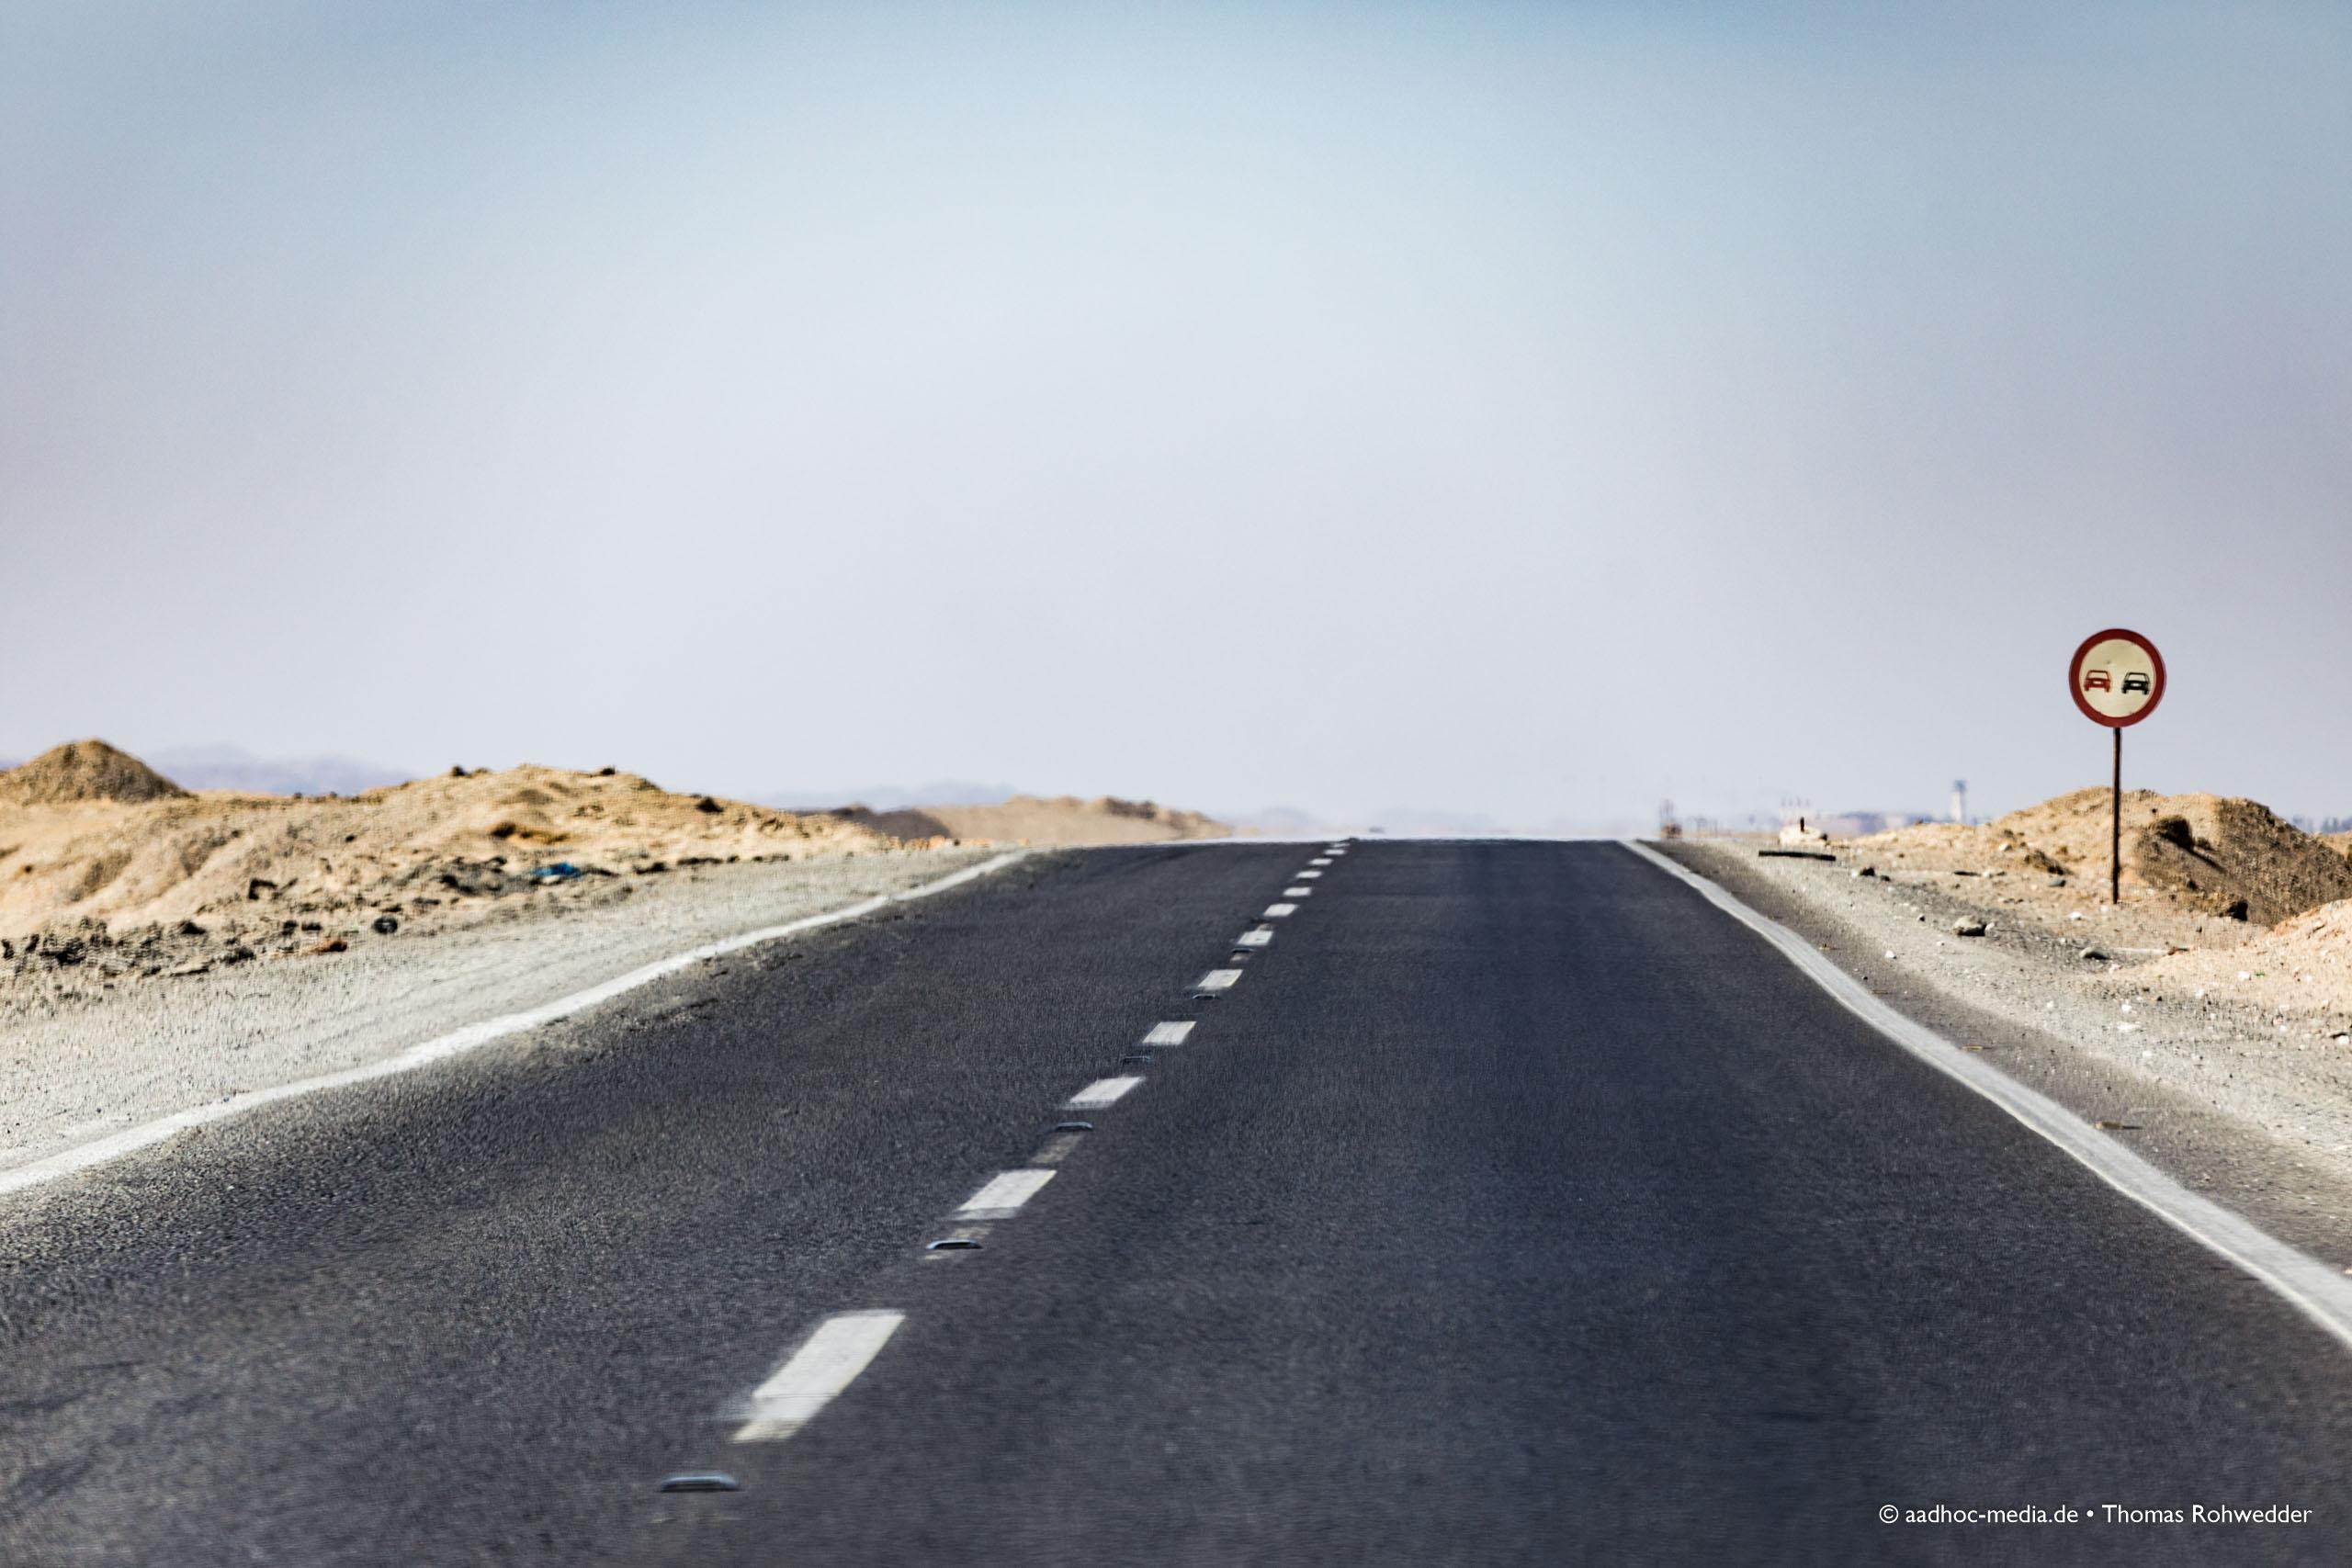 Egypt, Ägyptenreise nach Marsa Alam 2018. © aadhoc-media • Thomas Rohwedder